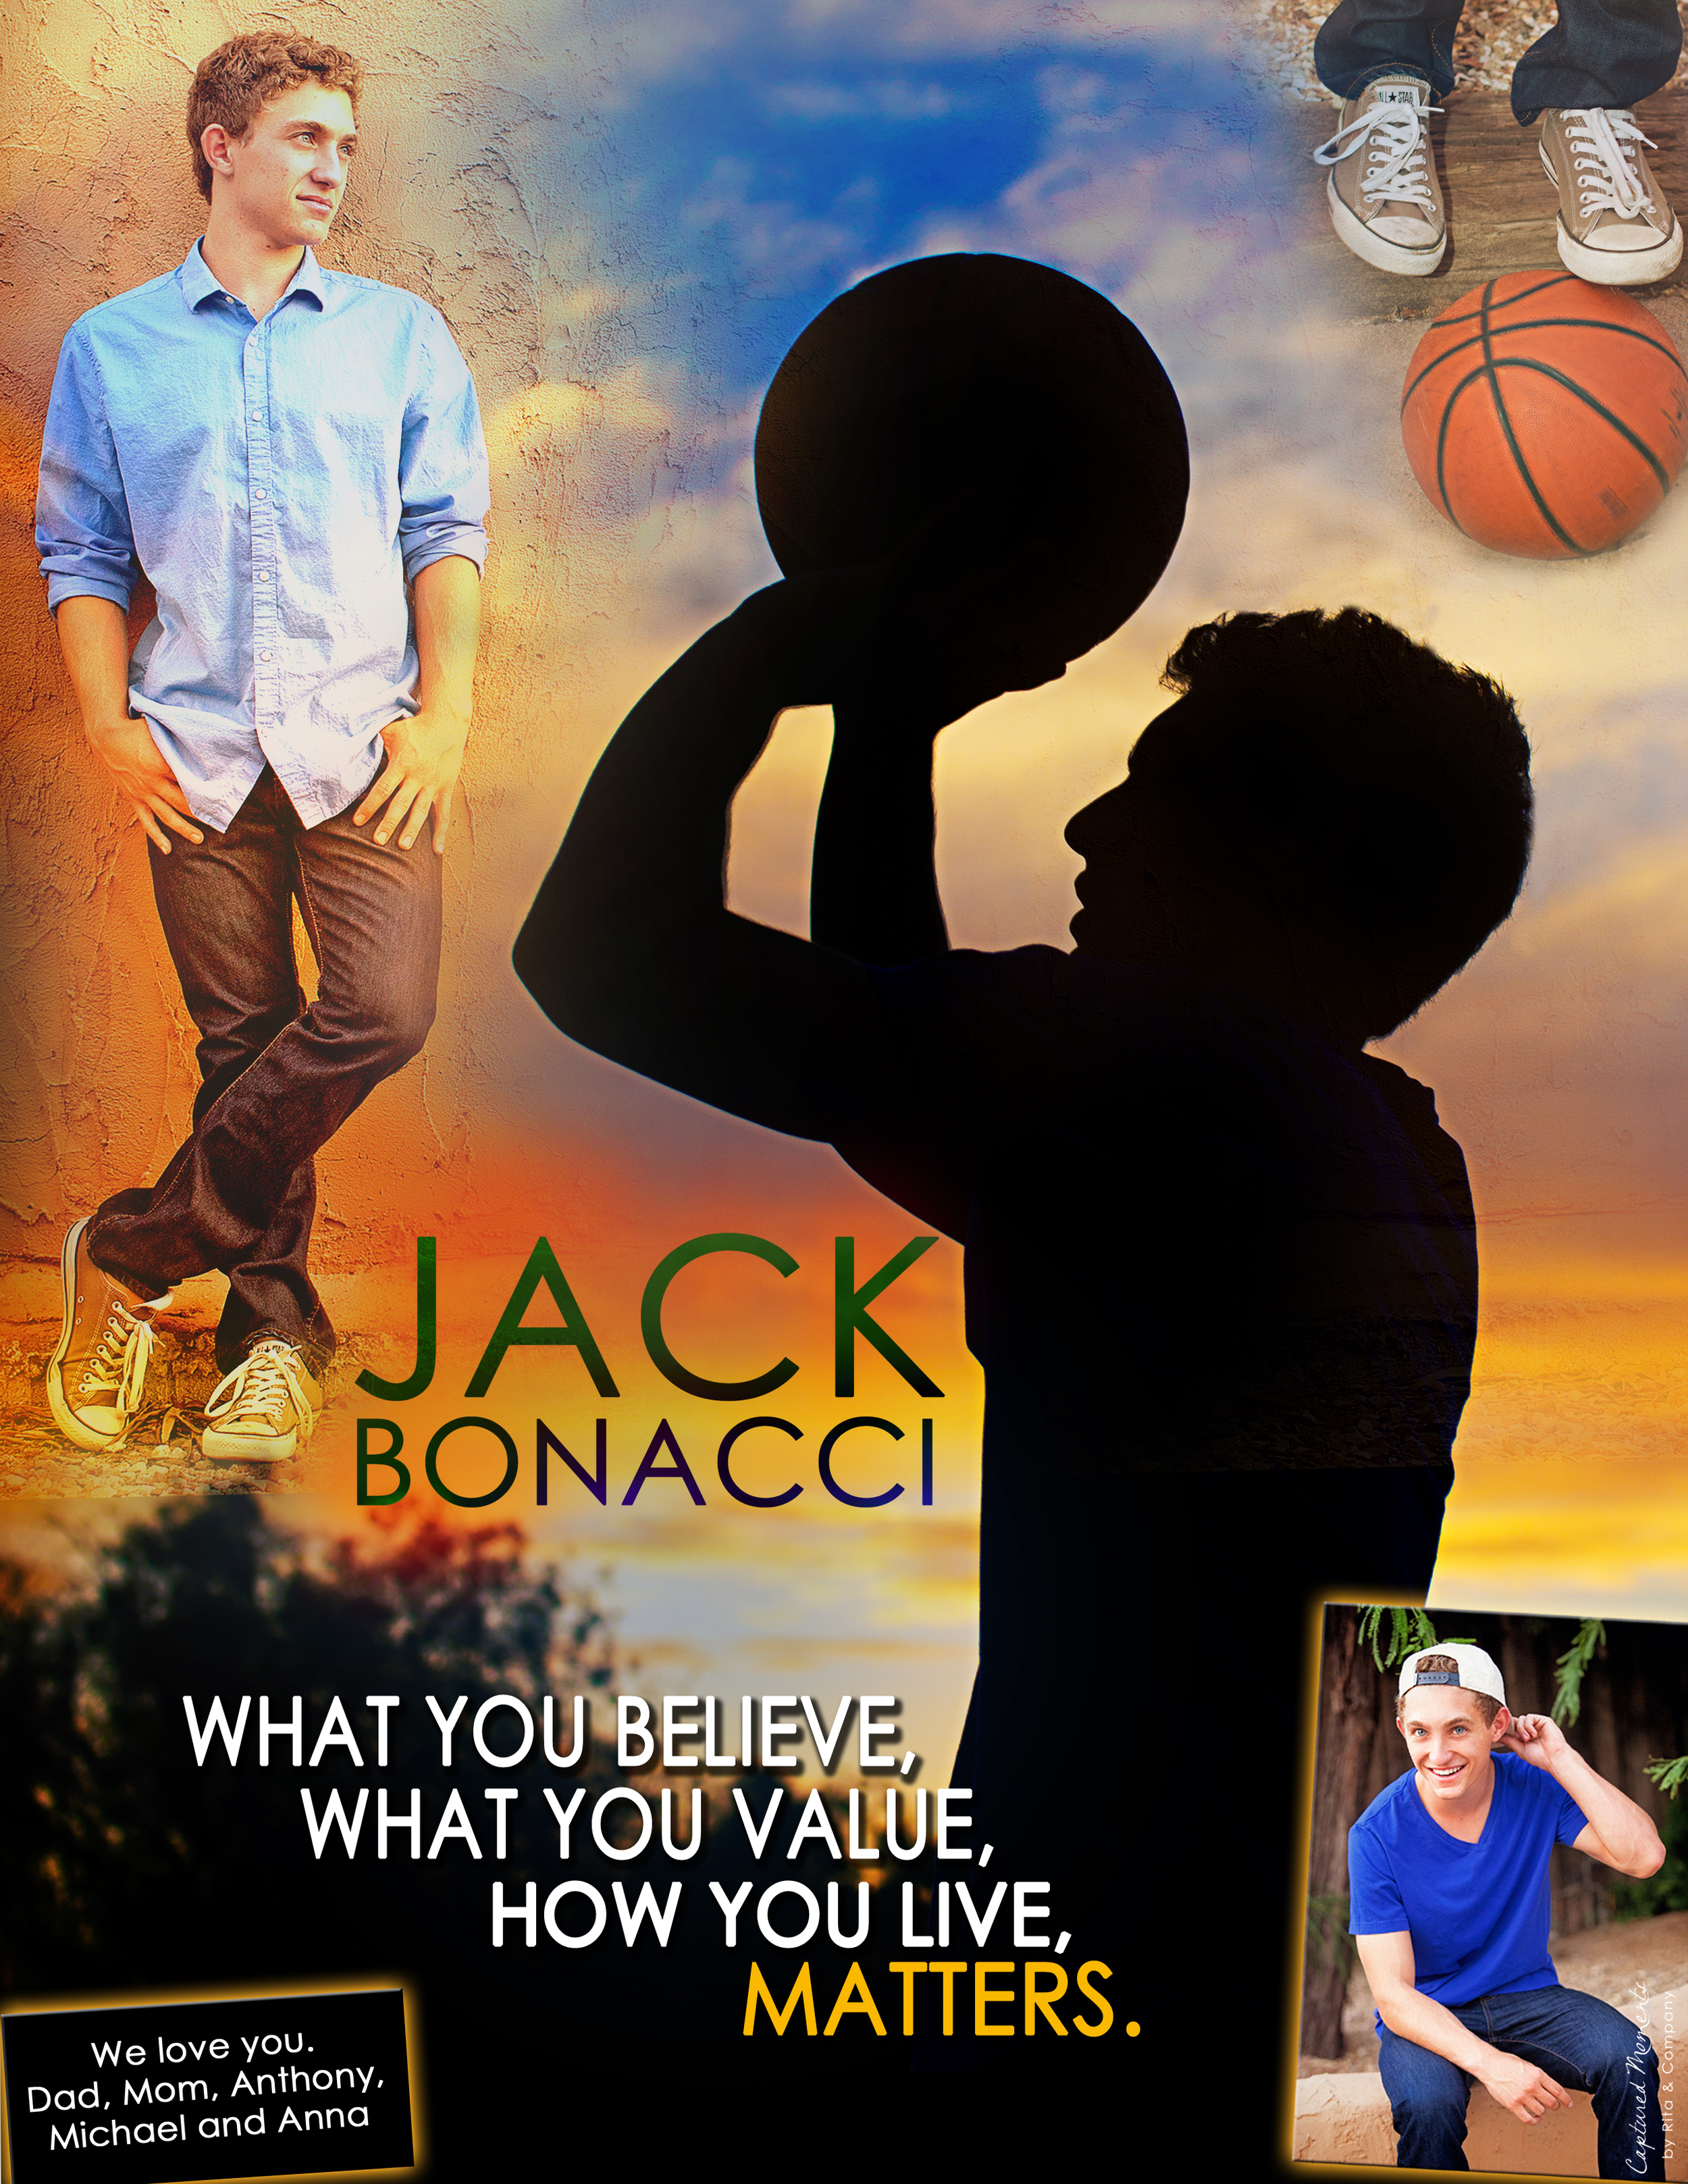 Jack Bonacci